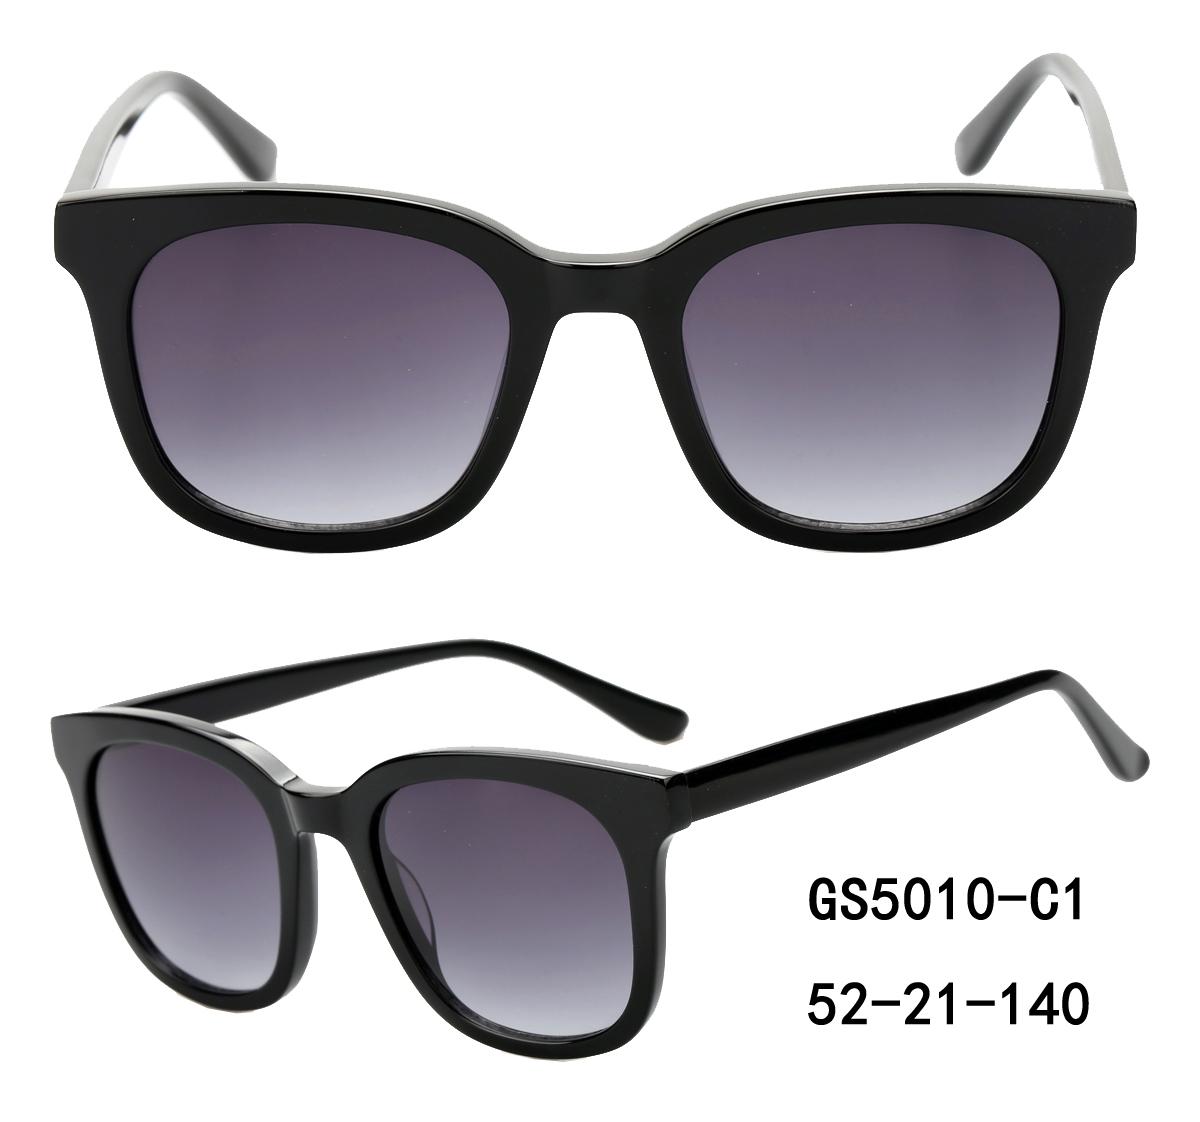 Oversized Polarized Acetate Sunglasses Wholesale,Black,Grey,Green Blue Custom Men Women Unisex